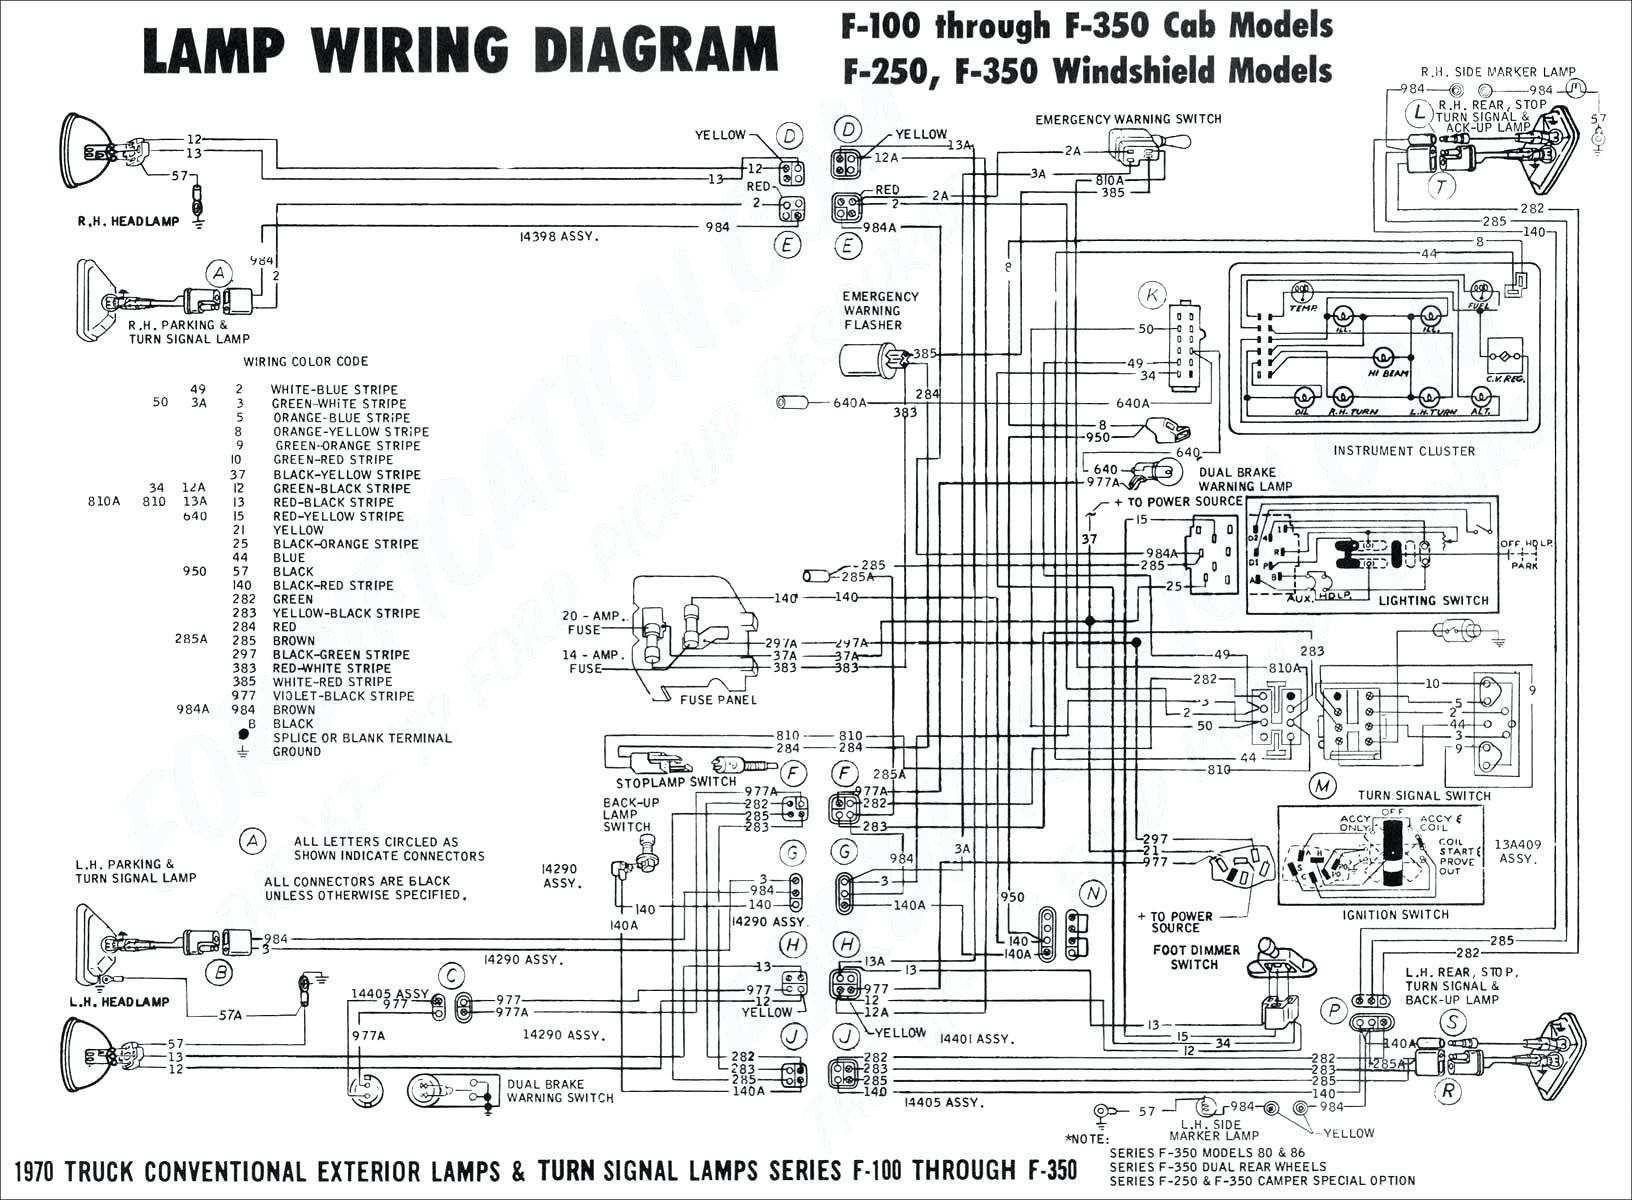 New Vw Golf 4 Central Locking Wiring Diagram | Electrical wiring diagram,  Diagram, Trailer wiring diagramPinterest